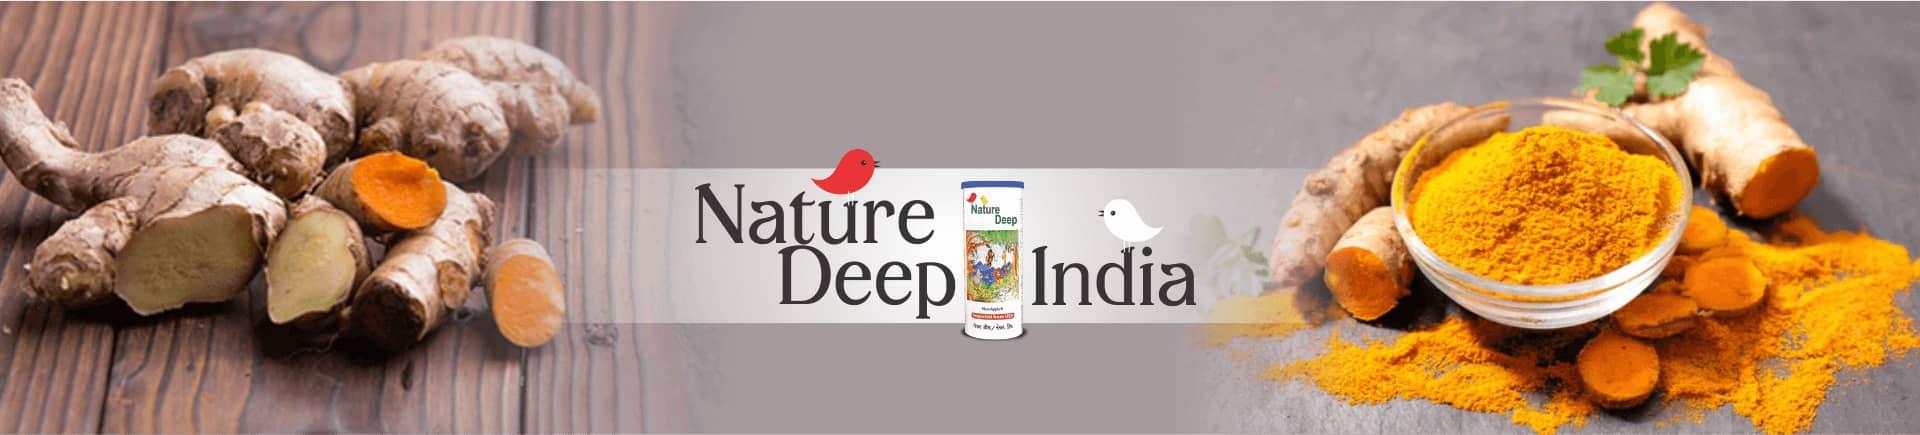 sumitomo naturedeep for ginger turmeric crop desktop banner